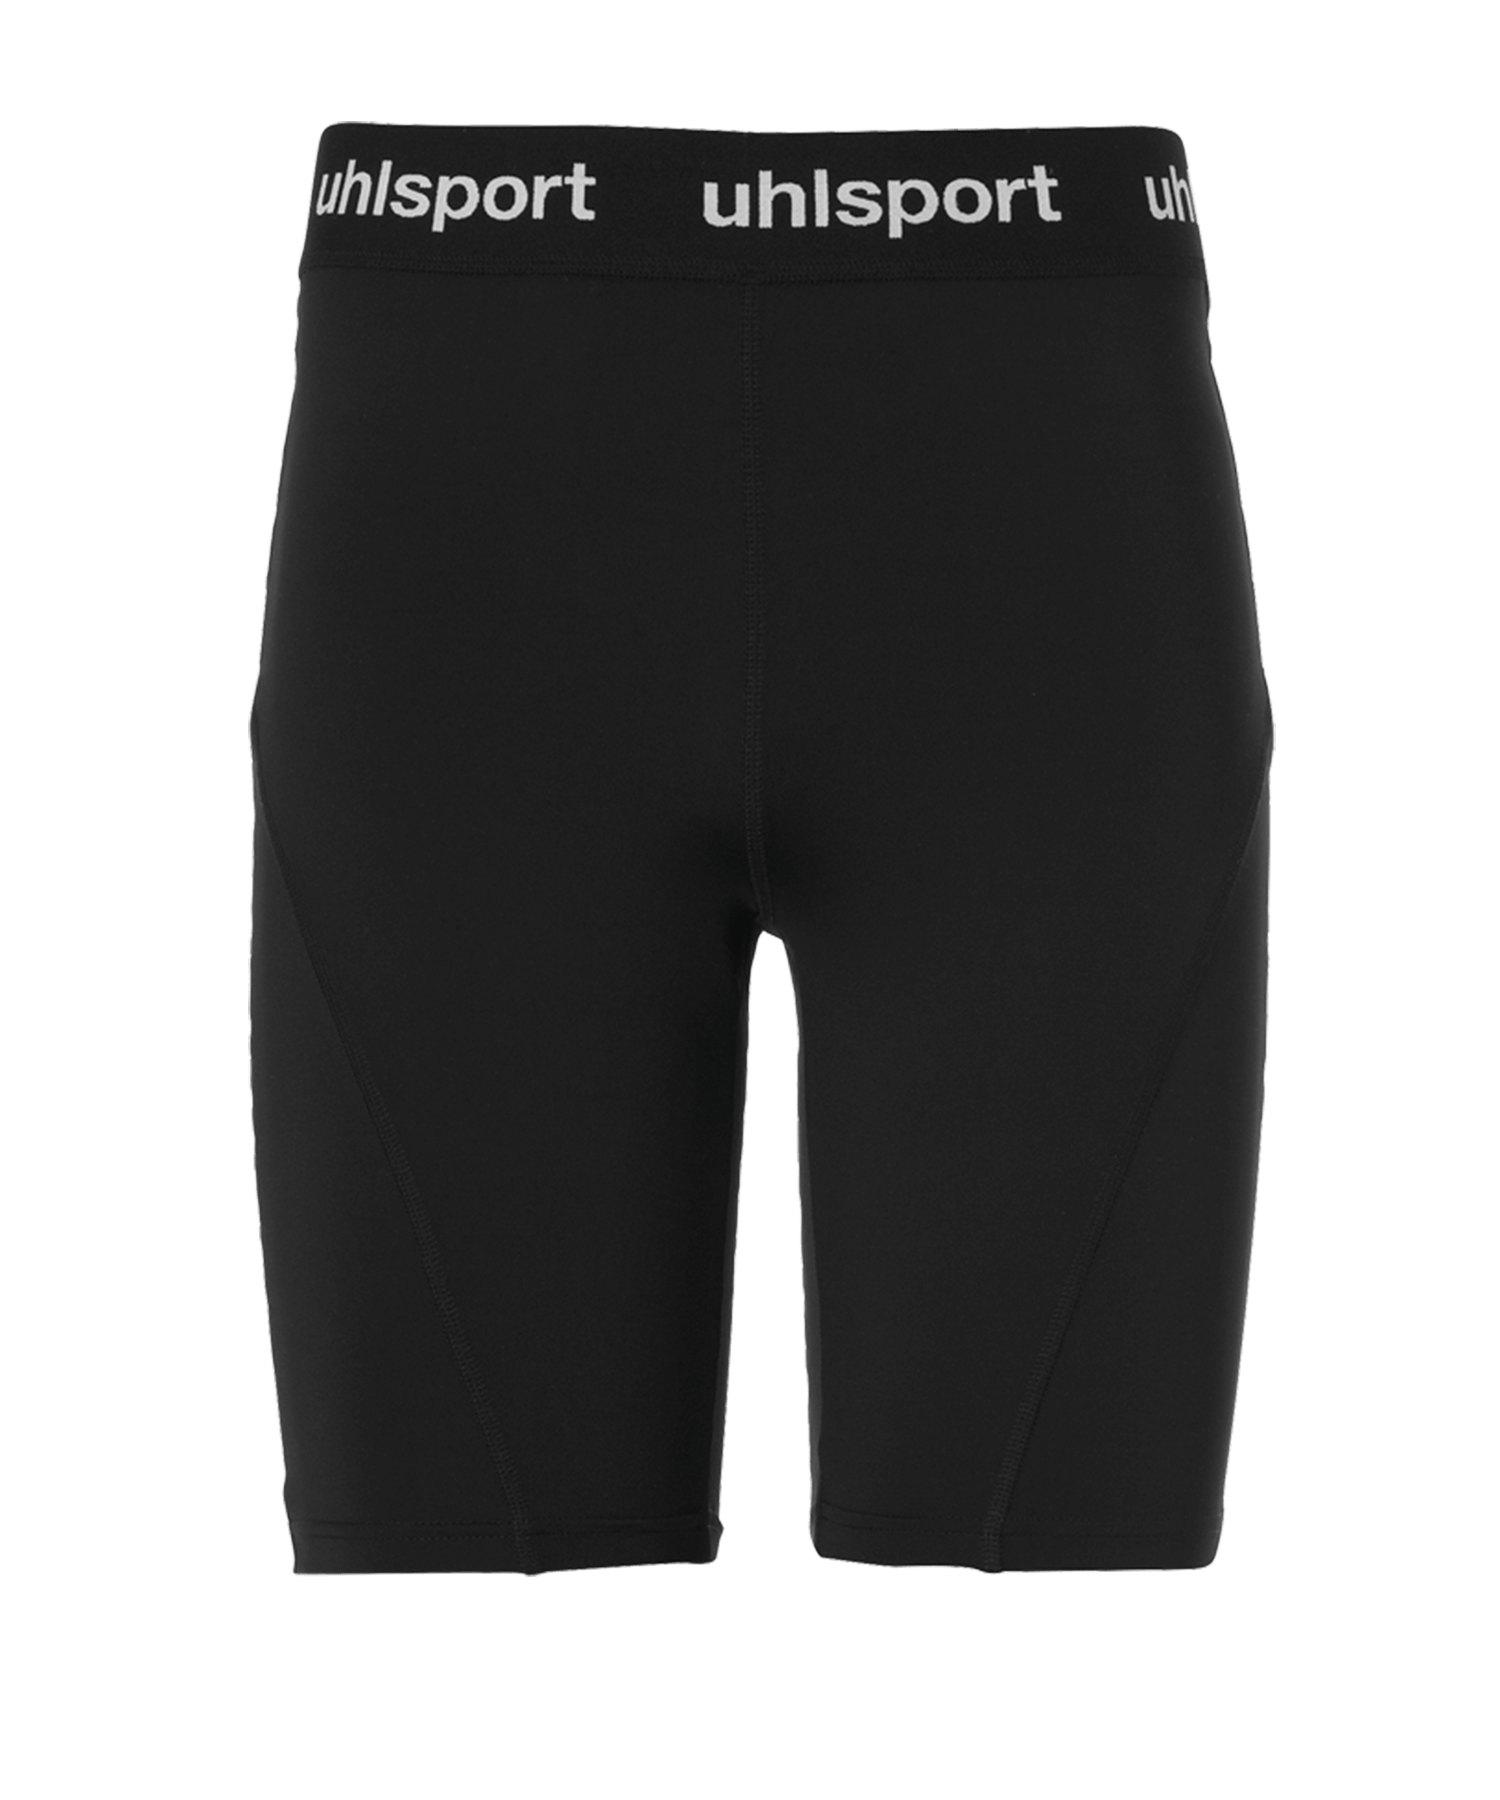 Uhlsport Tight Short Hose kurz Schwarz F01 - schwarz